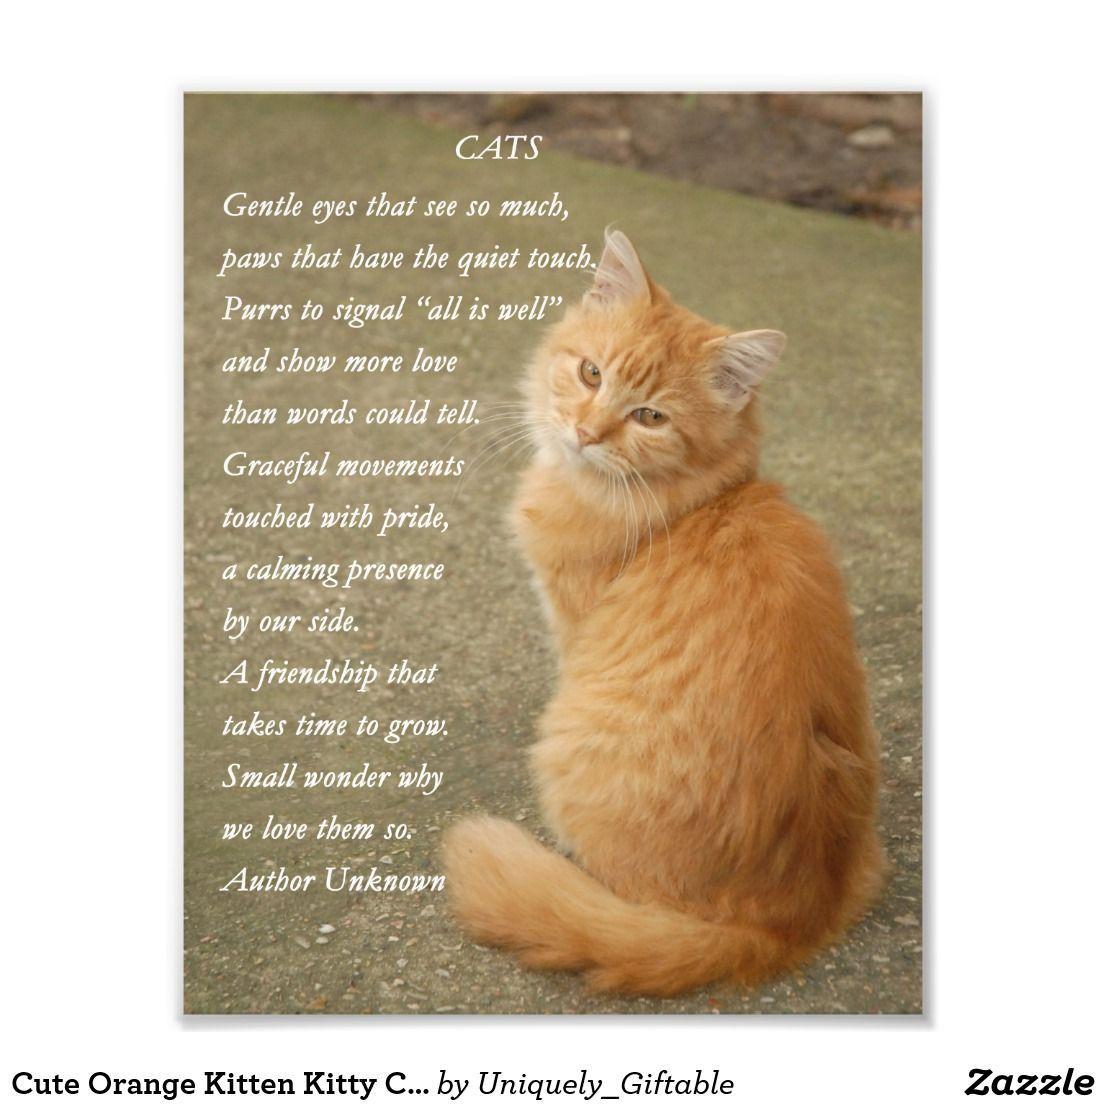 Cute Orange Kitten Kitty Cat Poem Photo Print Catsdiyfurniture Cat Poems Orange Kittens Kitten Photos